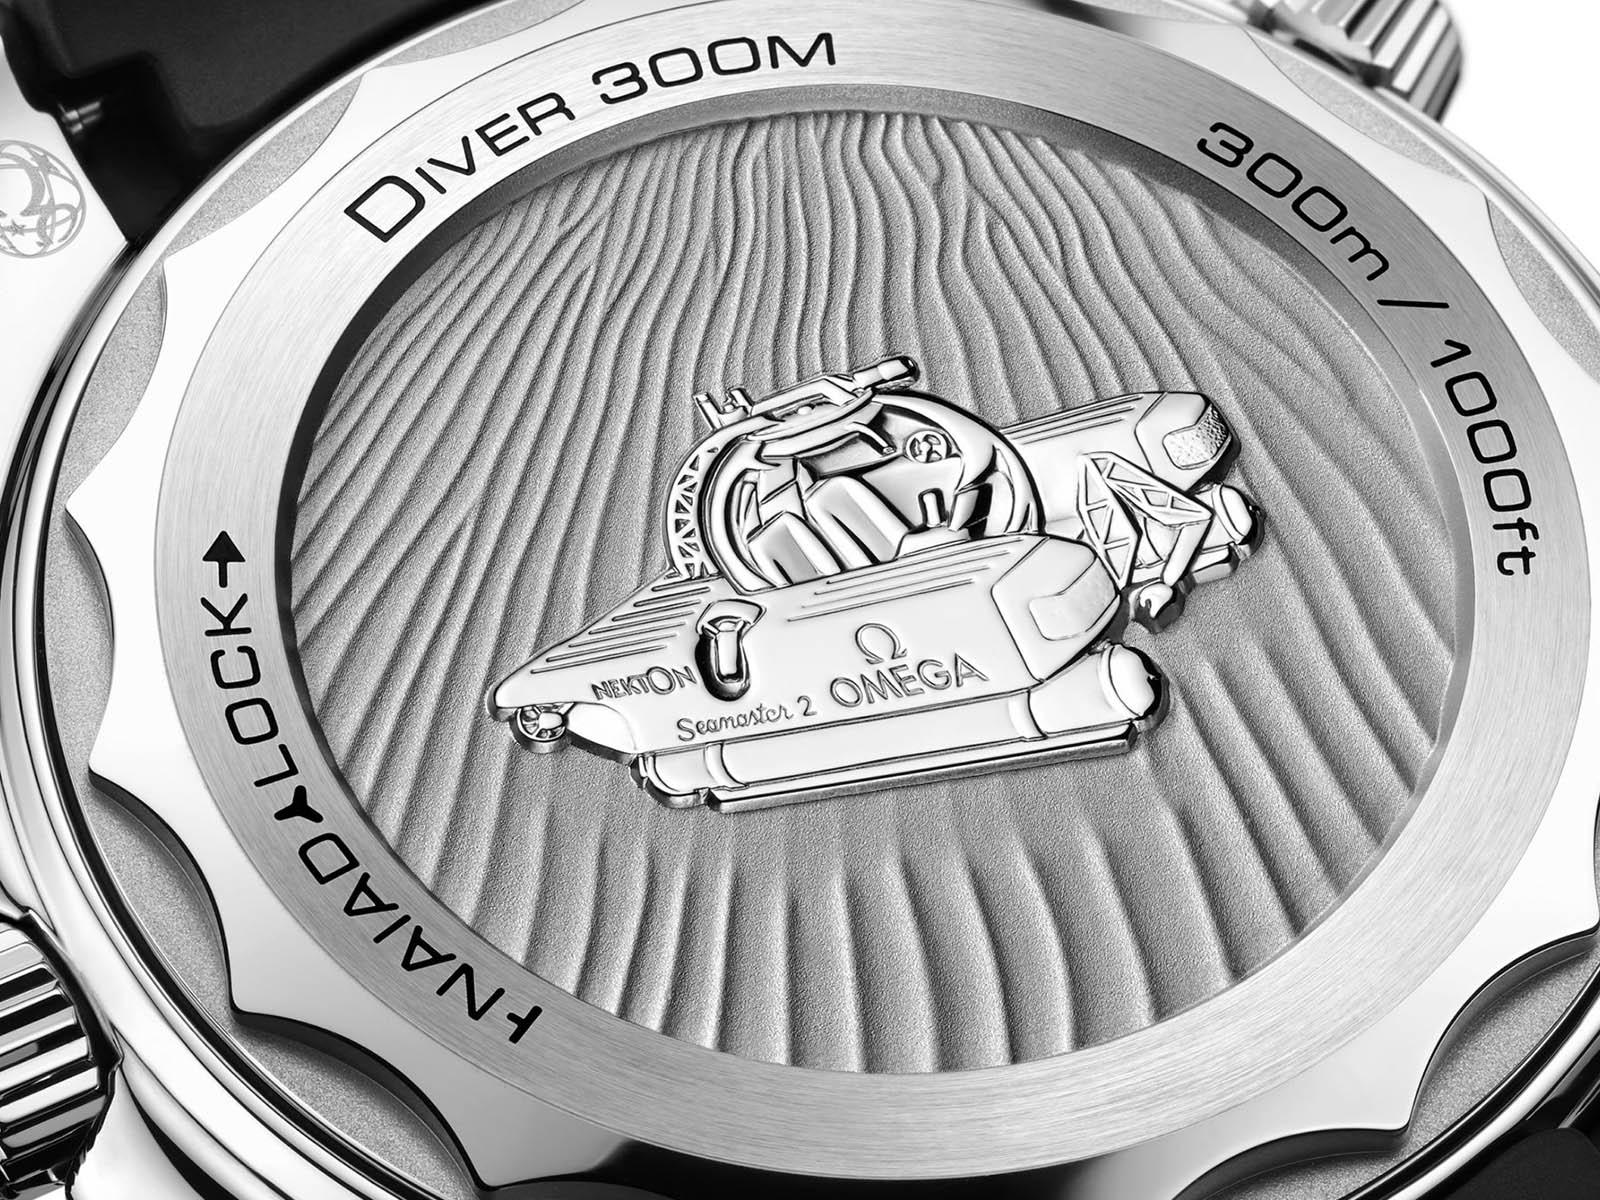 210-32-42-20-01-002-omega-seamaster-diver-300m-nekton-edition-5.jpg